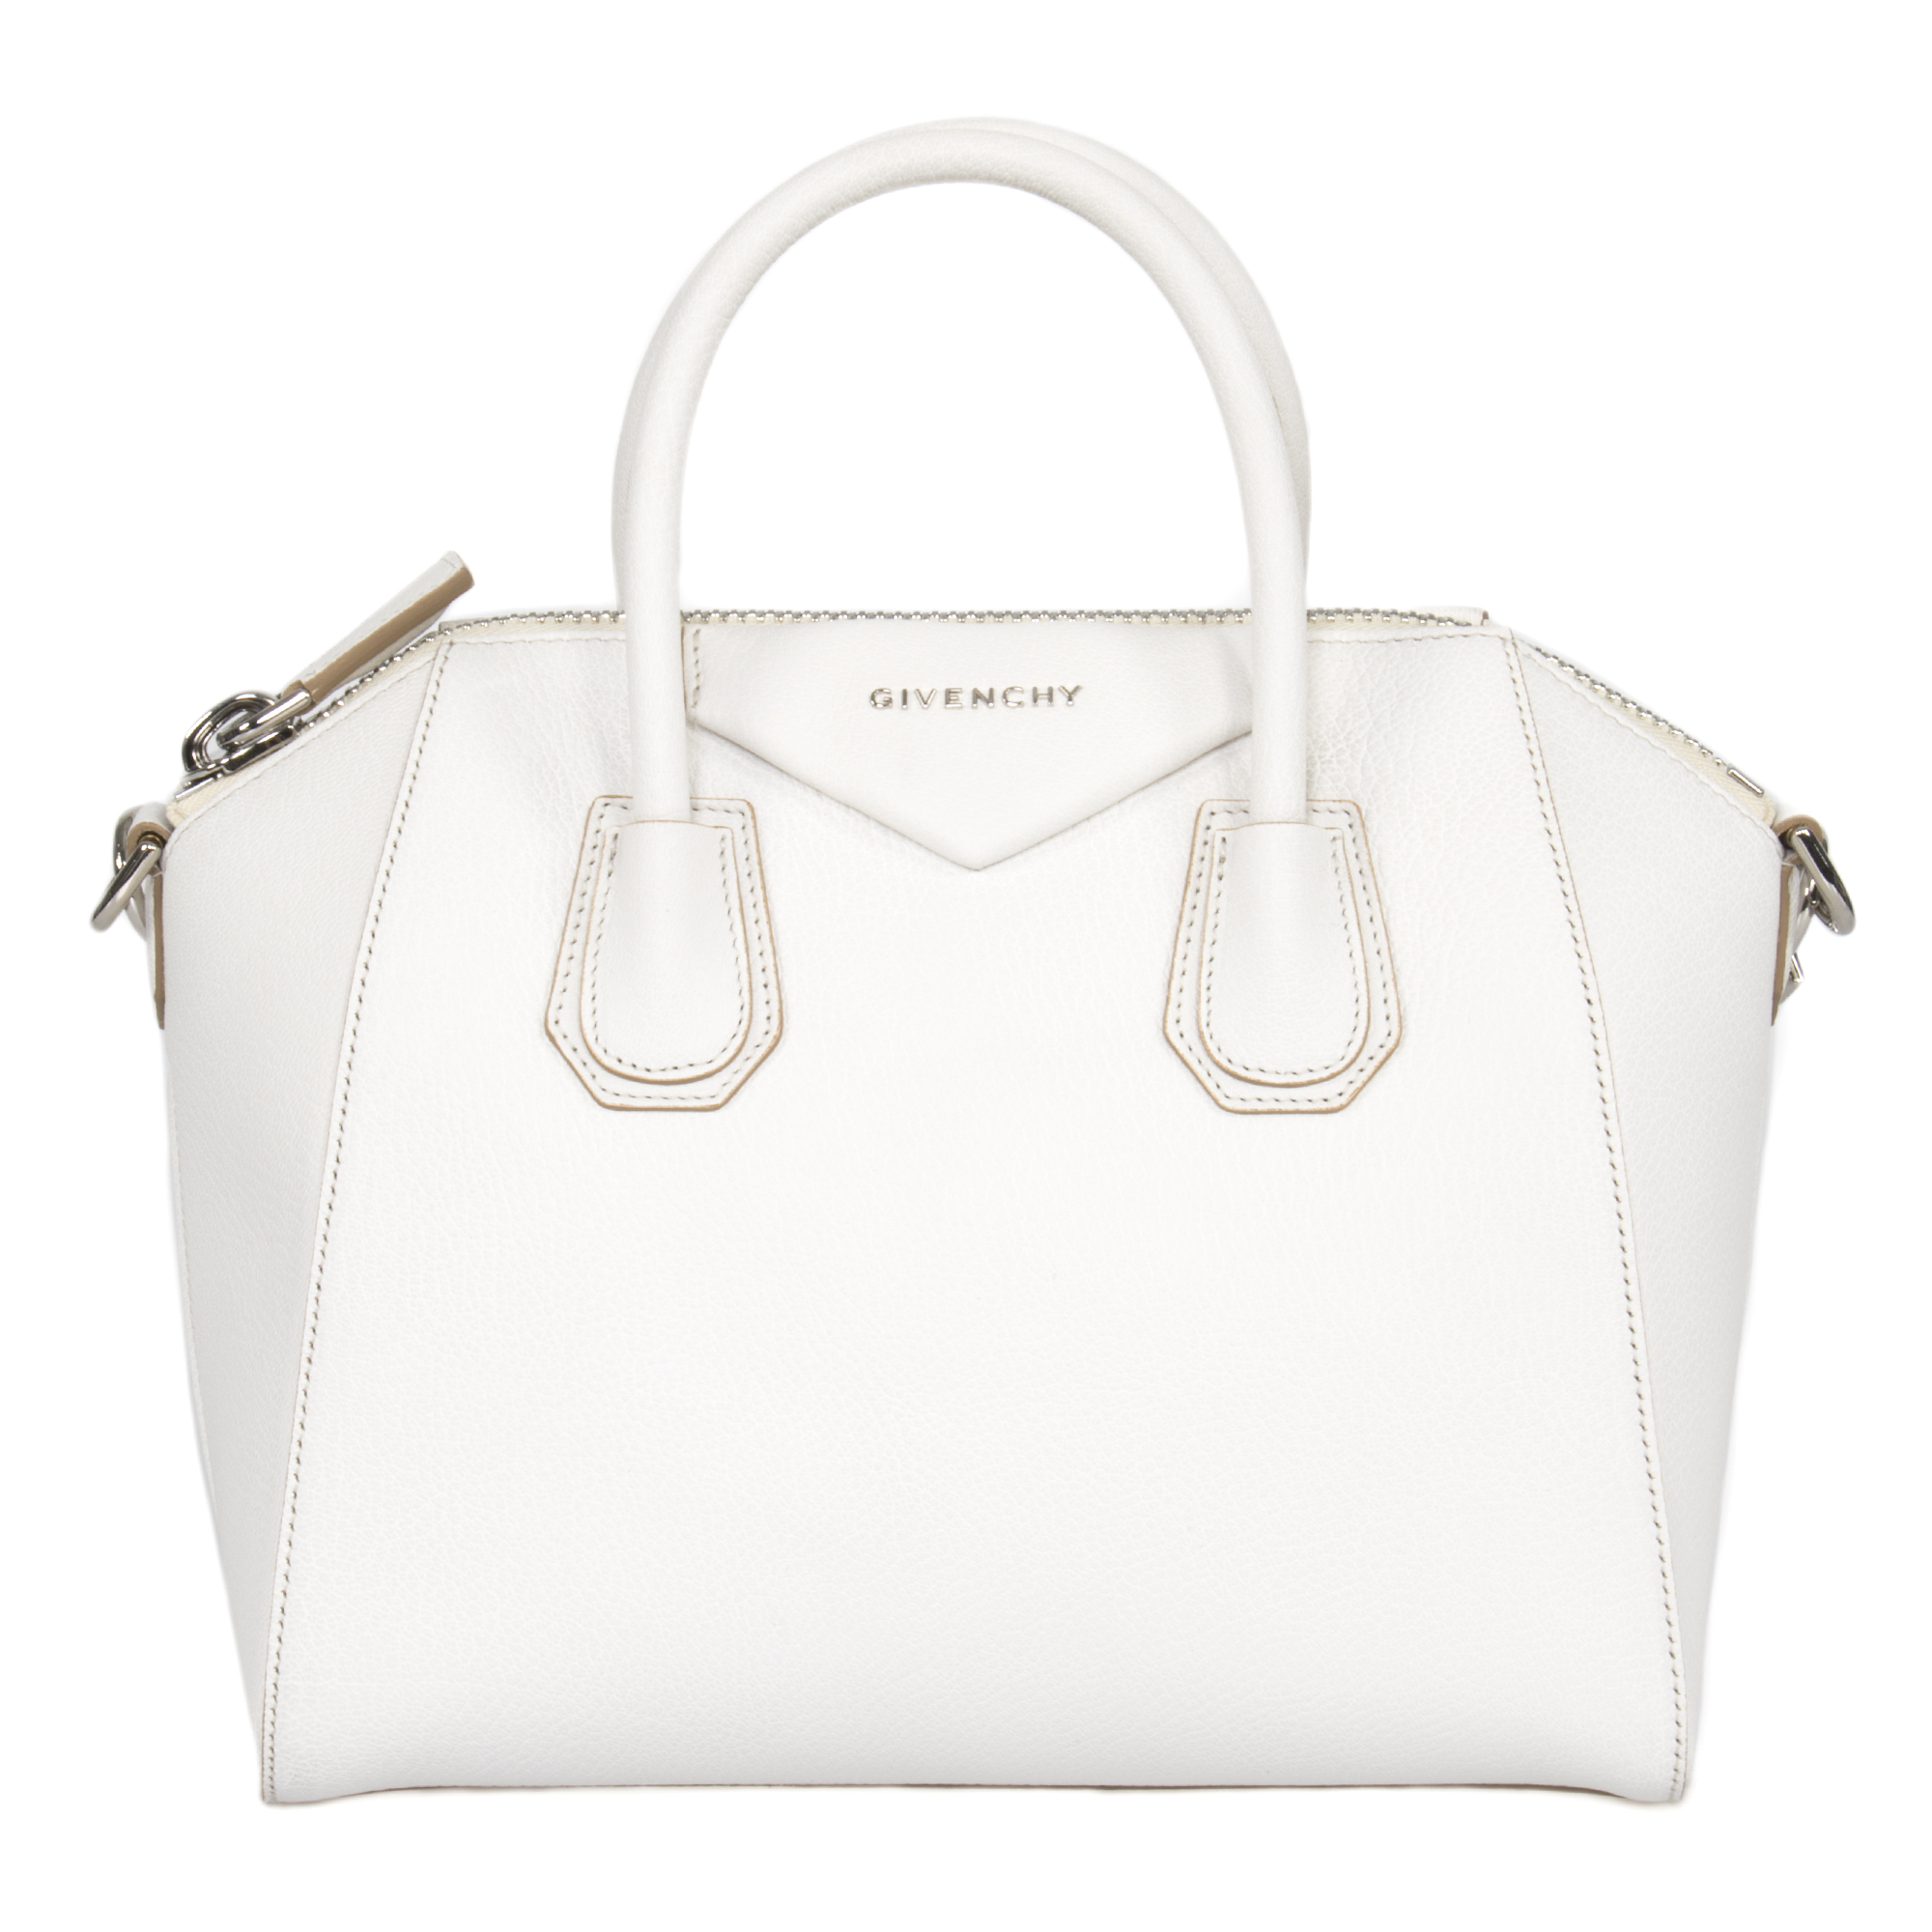 Givenchy Givenchy Antigona Sugar Goatskin Leather Satchel Bag ... 5c3fceee20267